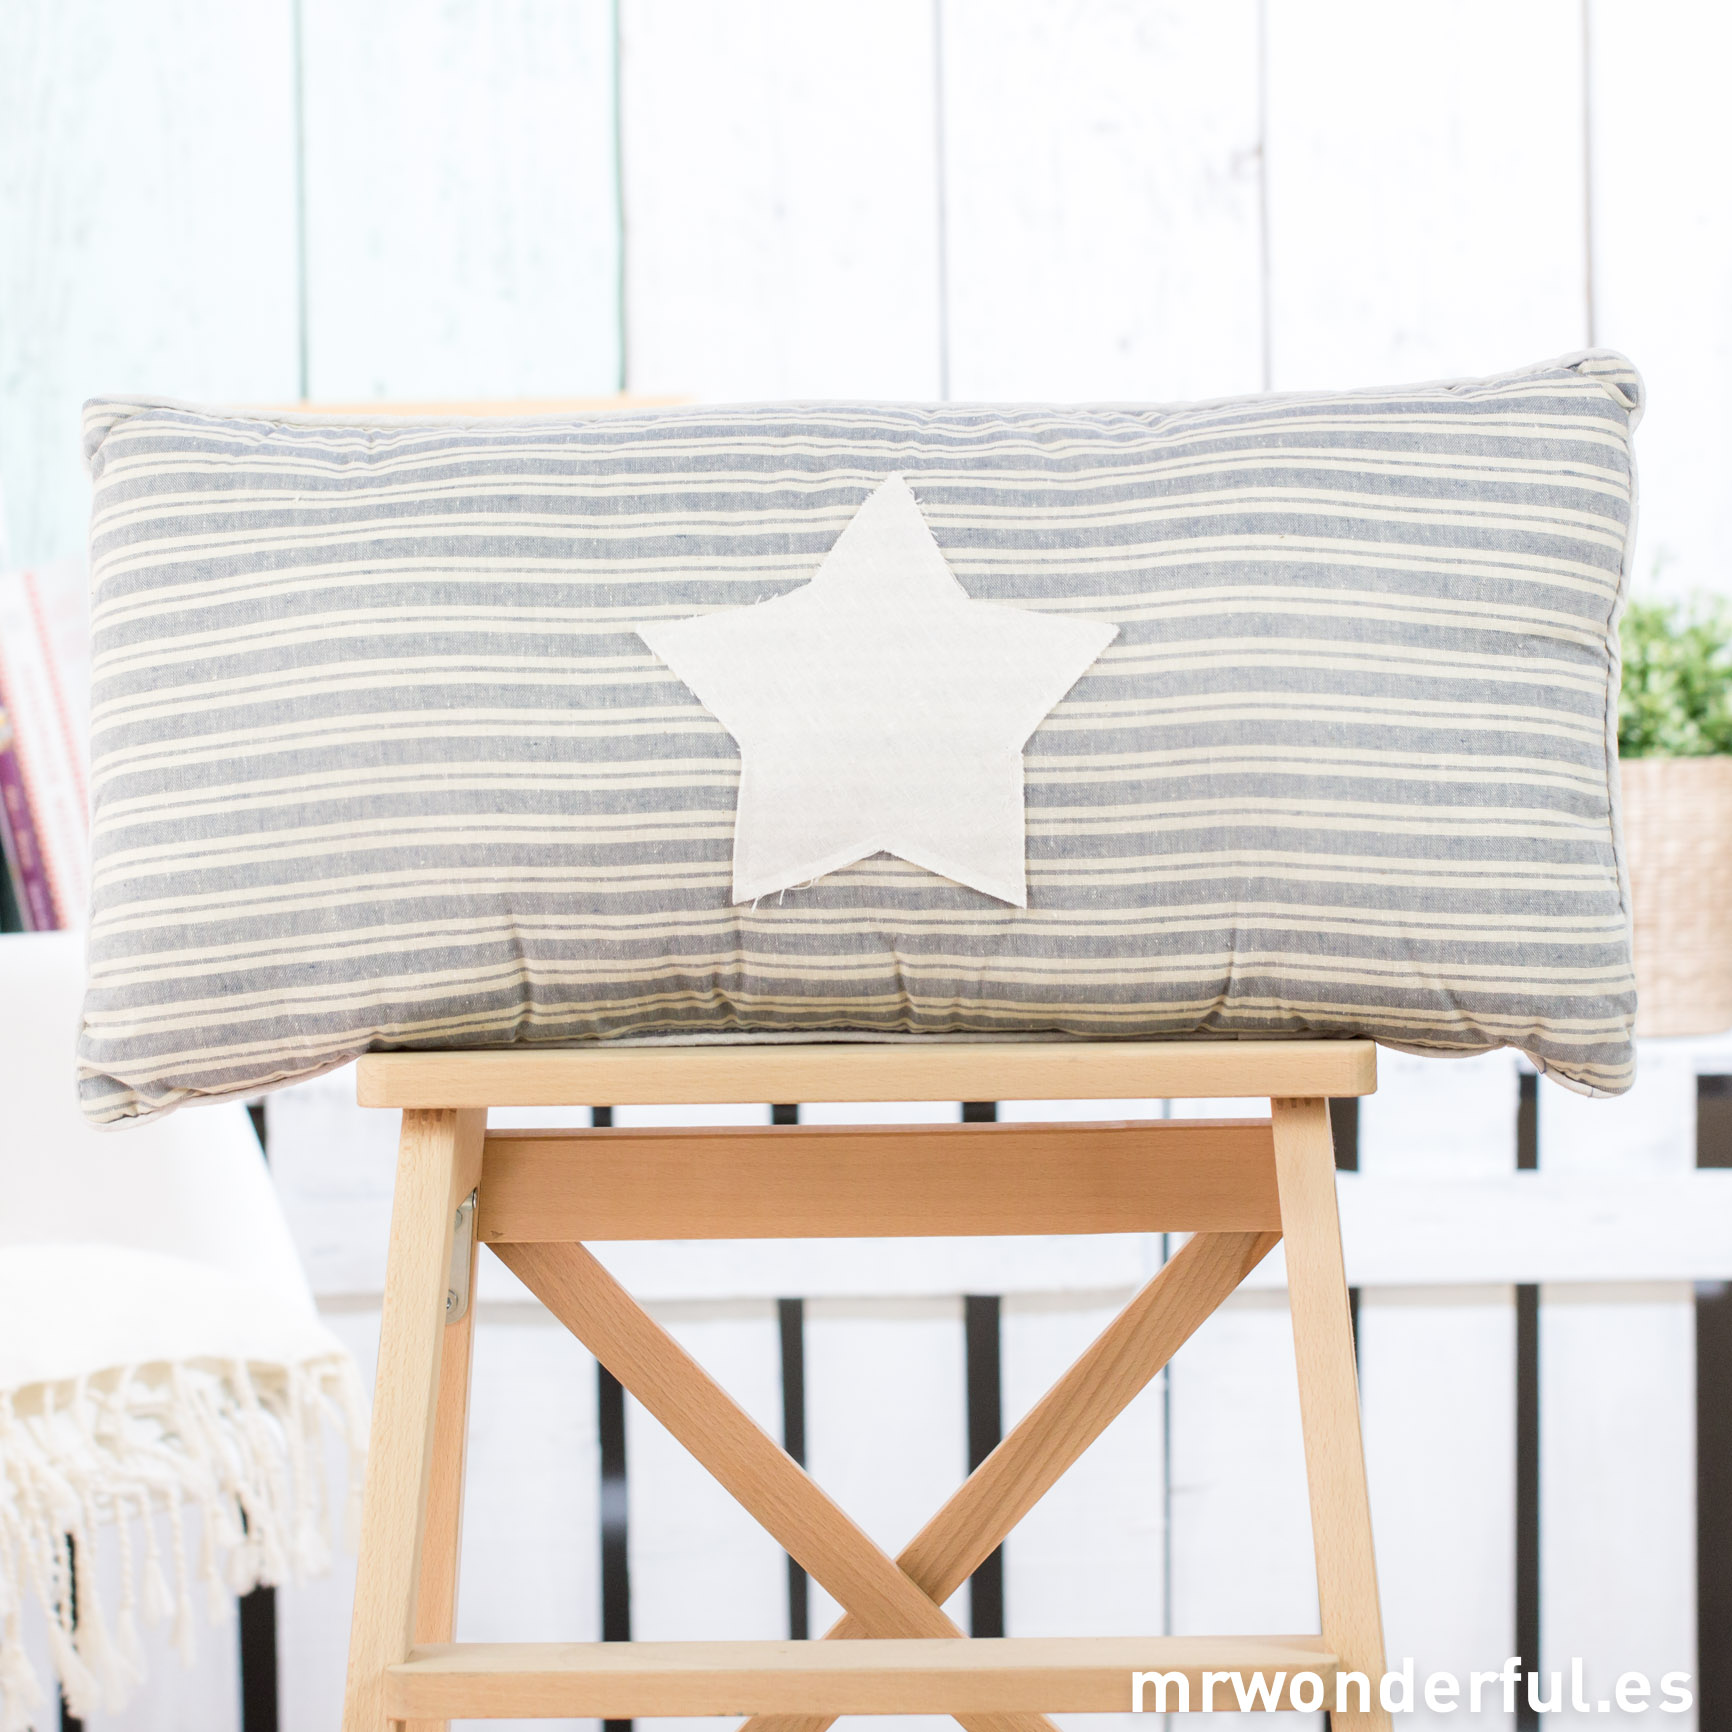 mrwonderful_52957A_cojin-rectangular_rayas-azules-blancas-estrella-13